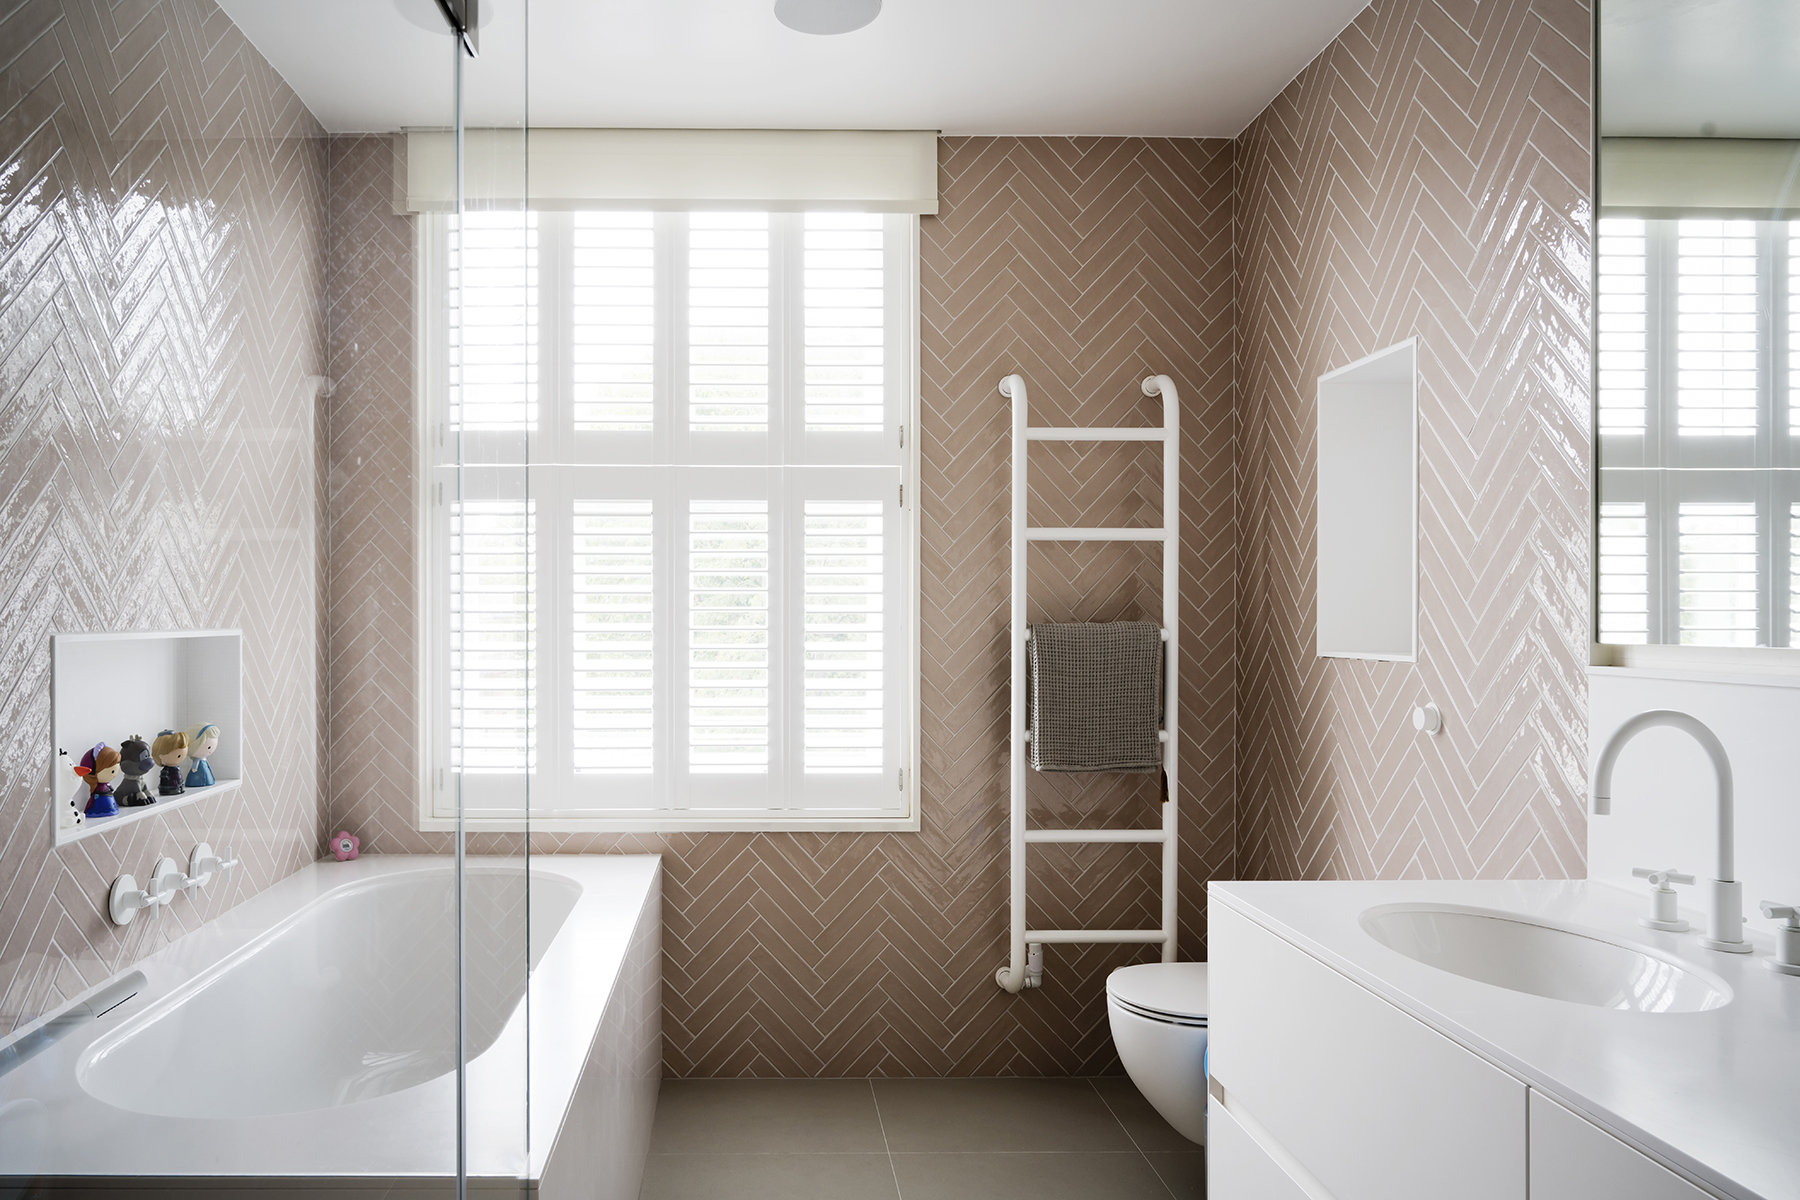 Girls_Bathroom_Kensington_London_W8_1675